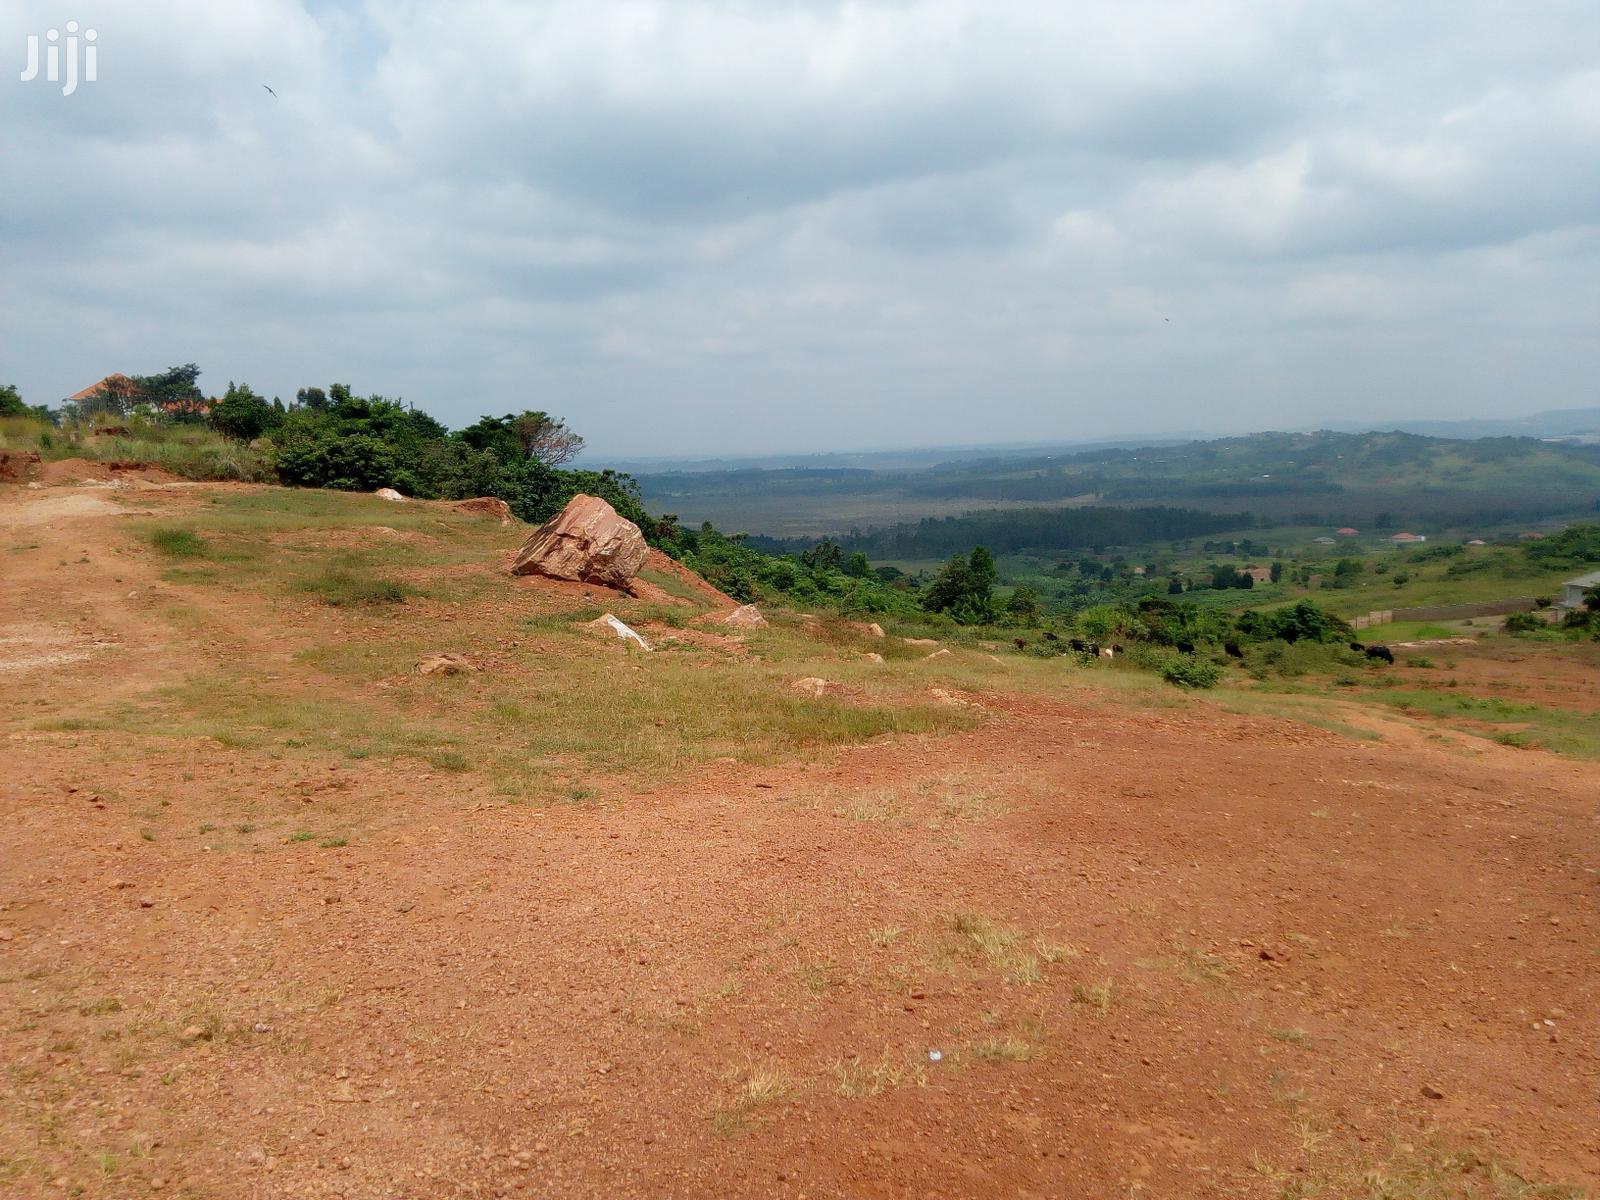 1 Acre Land For Sale In Lugala Masanafu | Land & Plots For Sale for sale in Kampala, Central Region, Uganda